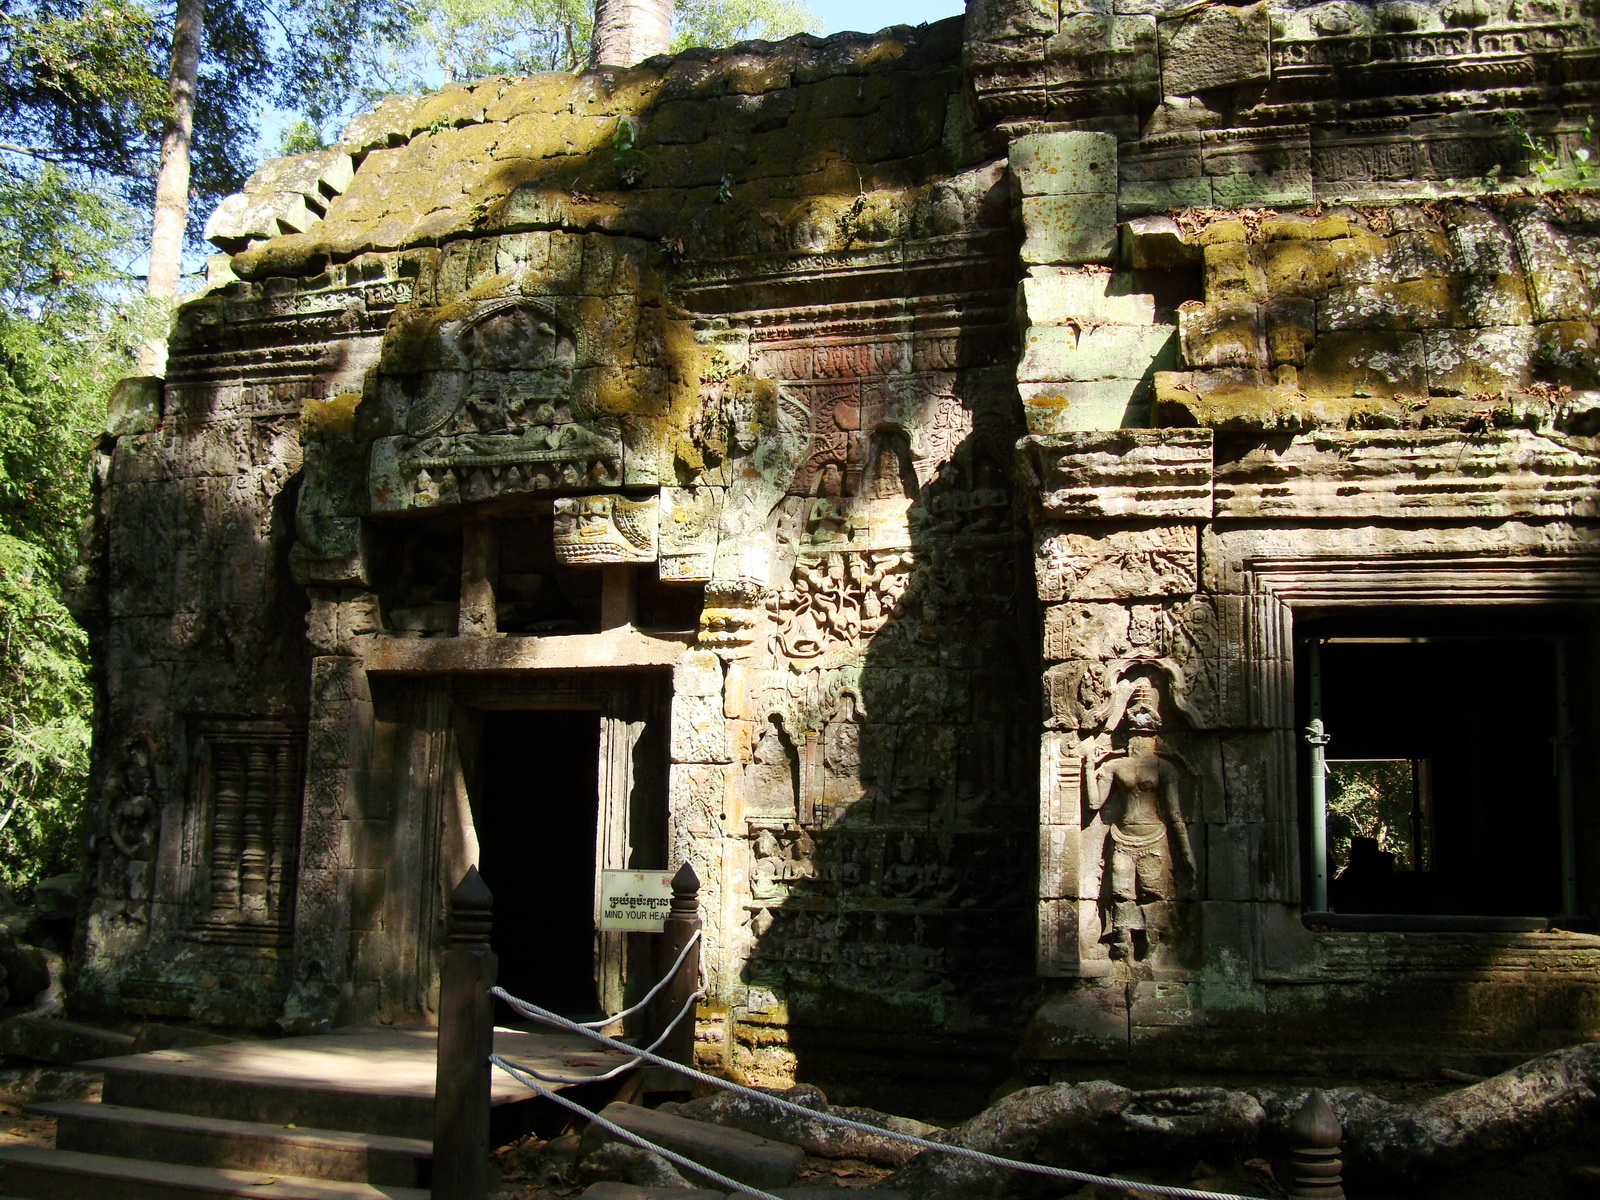 Ta Prohm Temple Rajavihara Tomb Raider third enclosure area 08